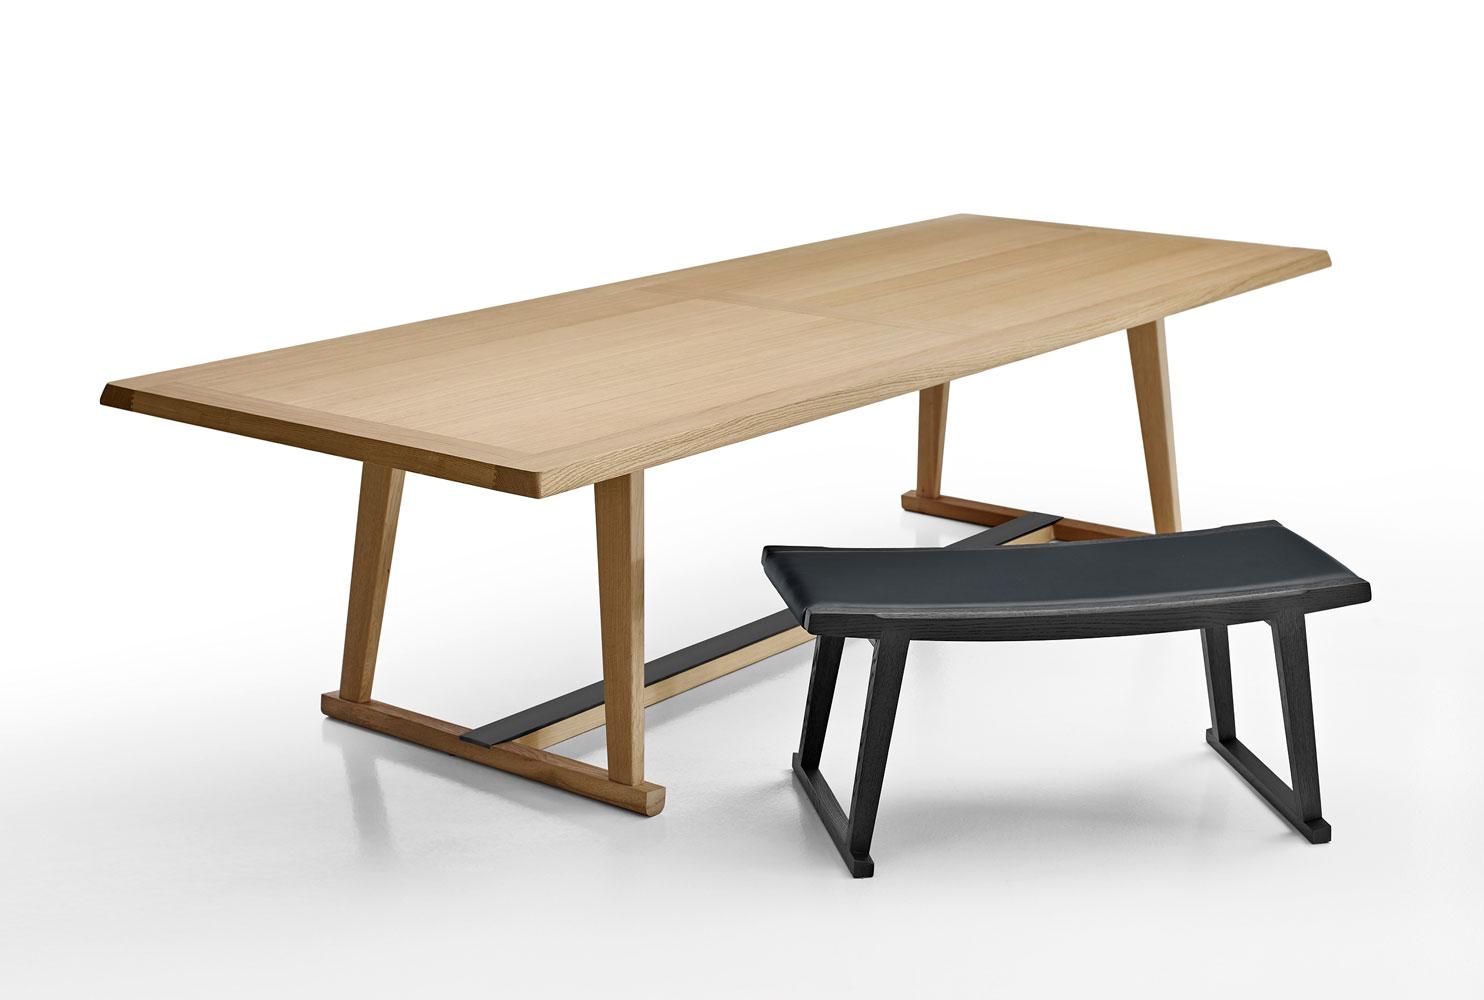 maxalto b b italia recipio 39 14 table buy from campbell. Black Bedroom Furniture Sets. Home Design Ideas